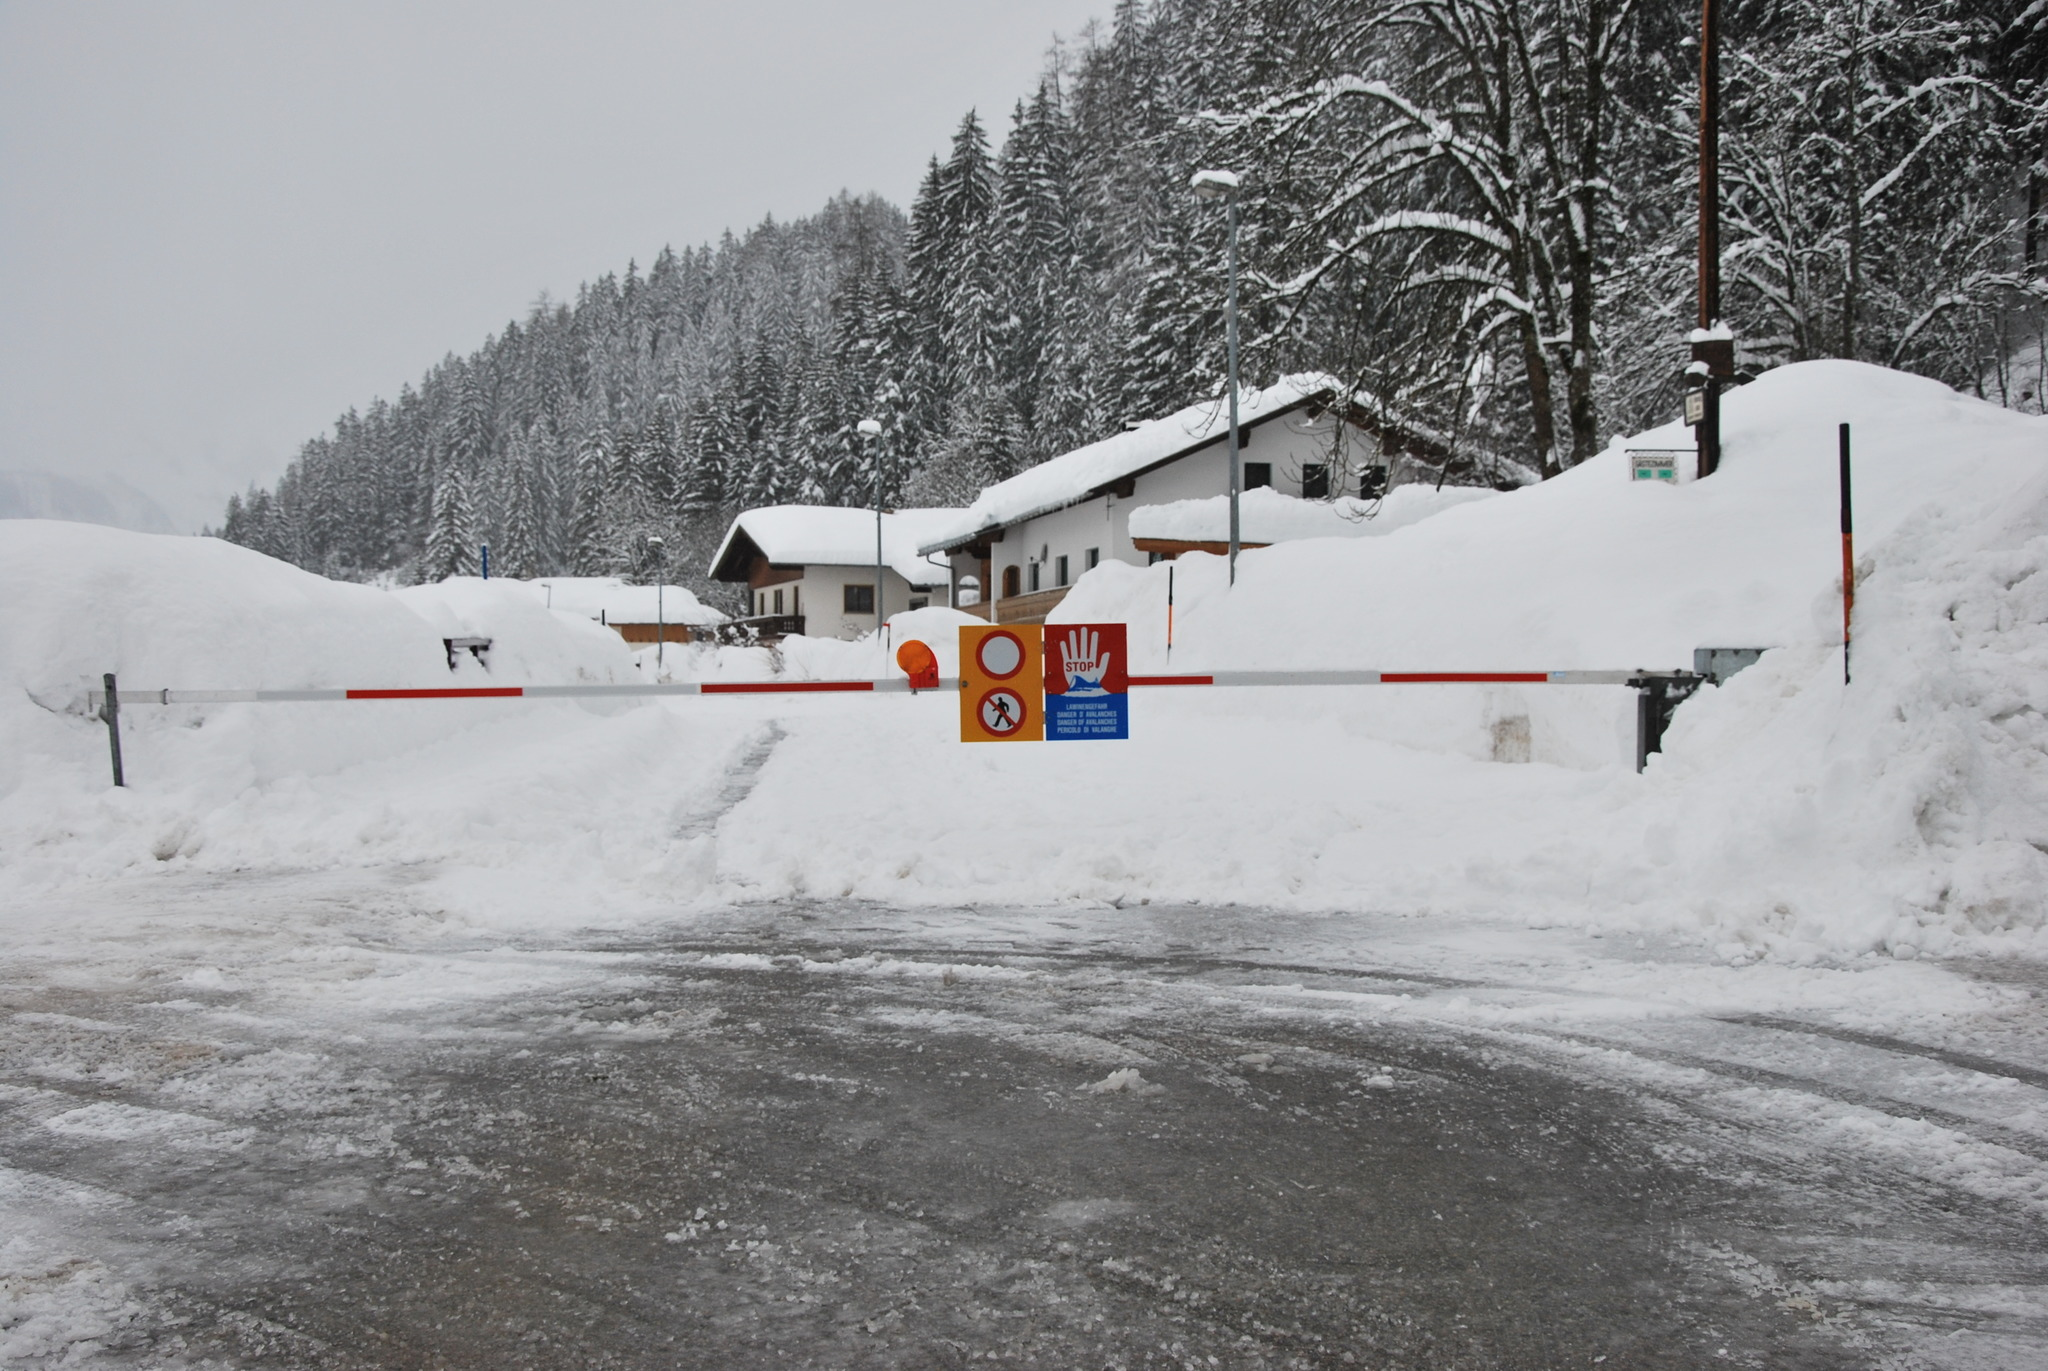 Straßensperrung Tirol